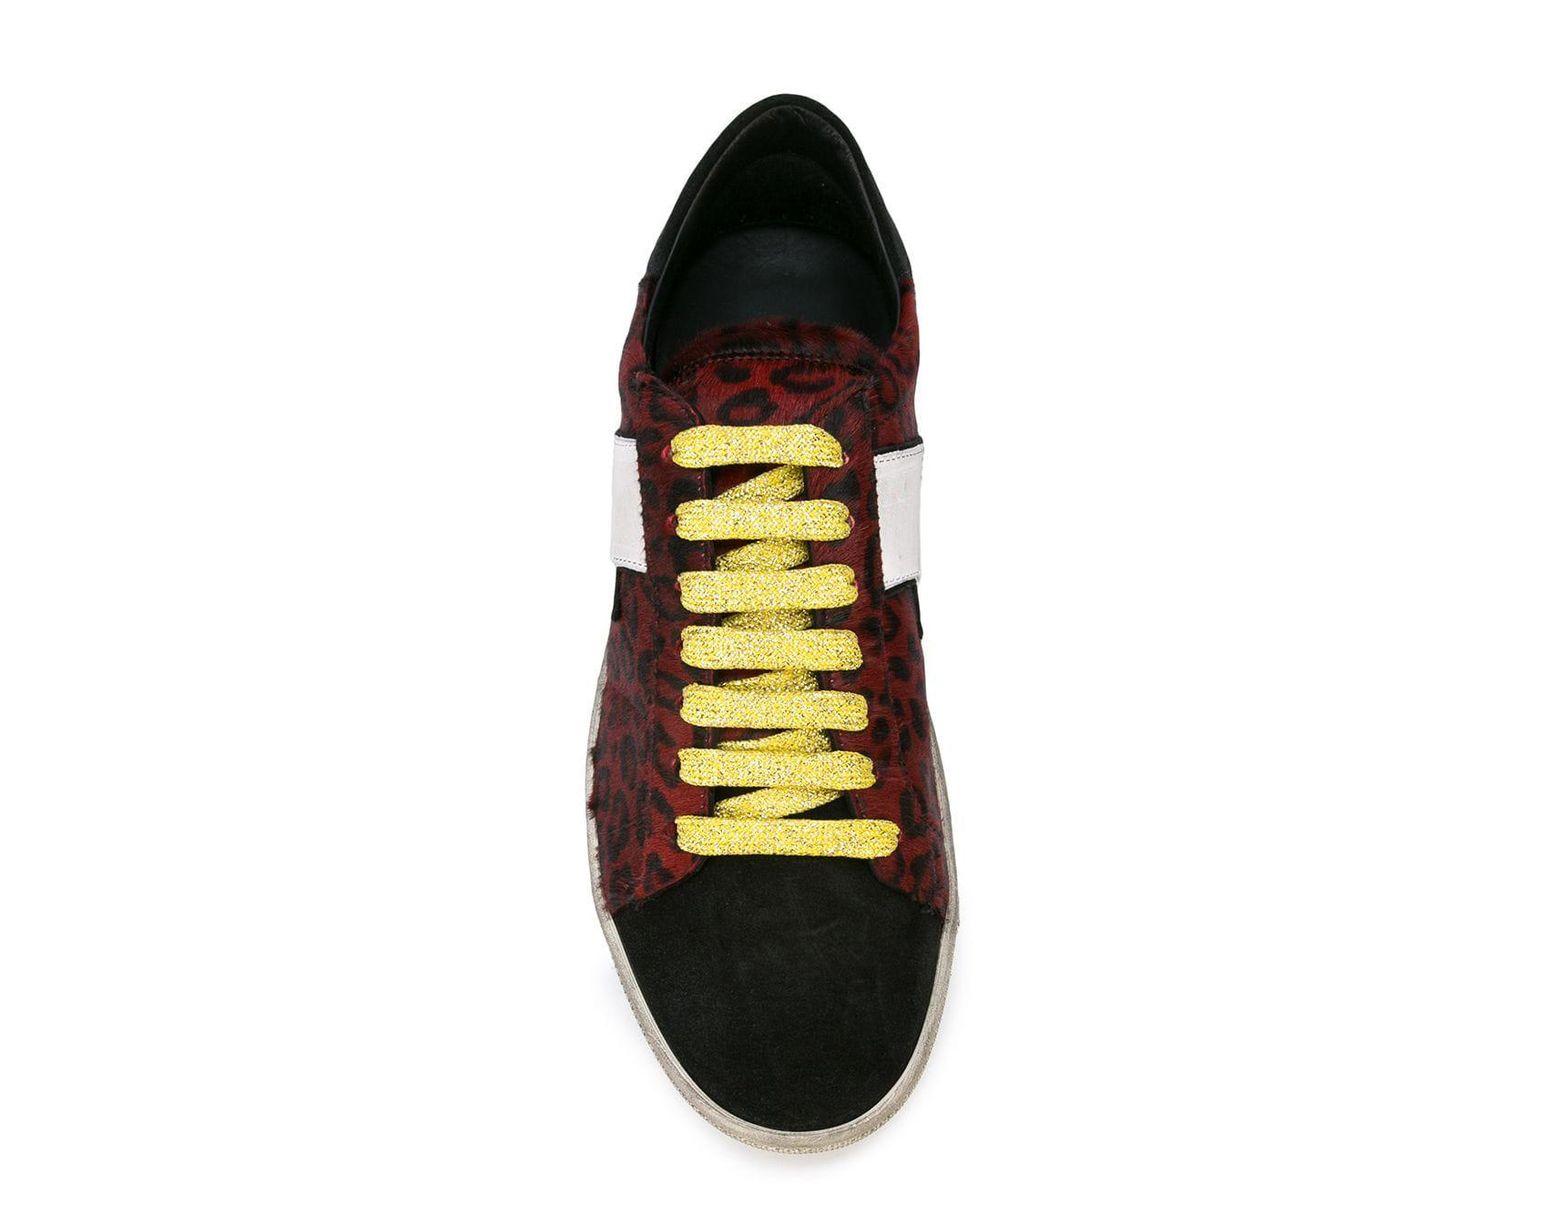 d24a0ba459ac Amiri Live Forever Leopard Viper Sneakers in Black for Men - Lyst